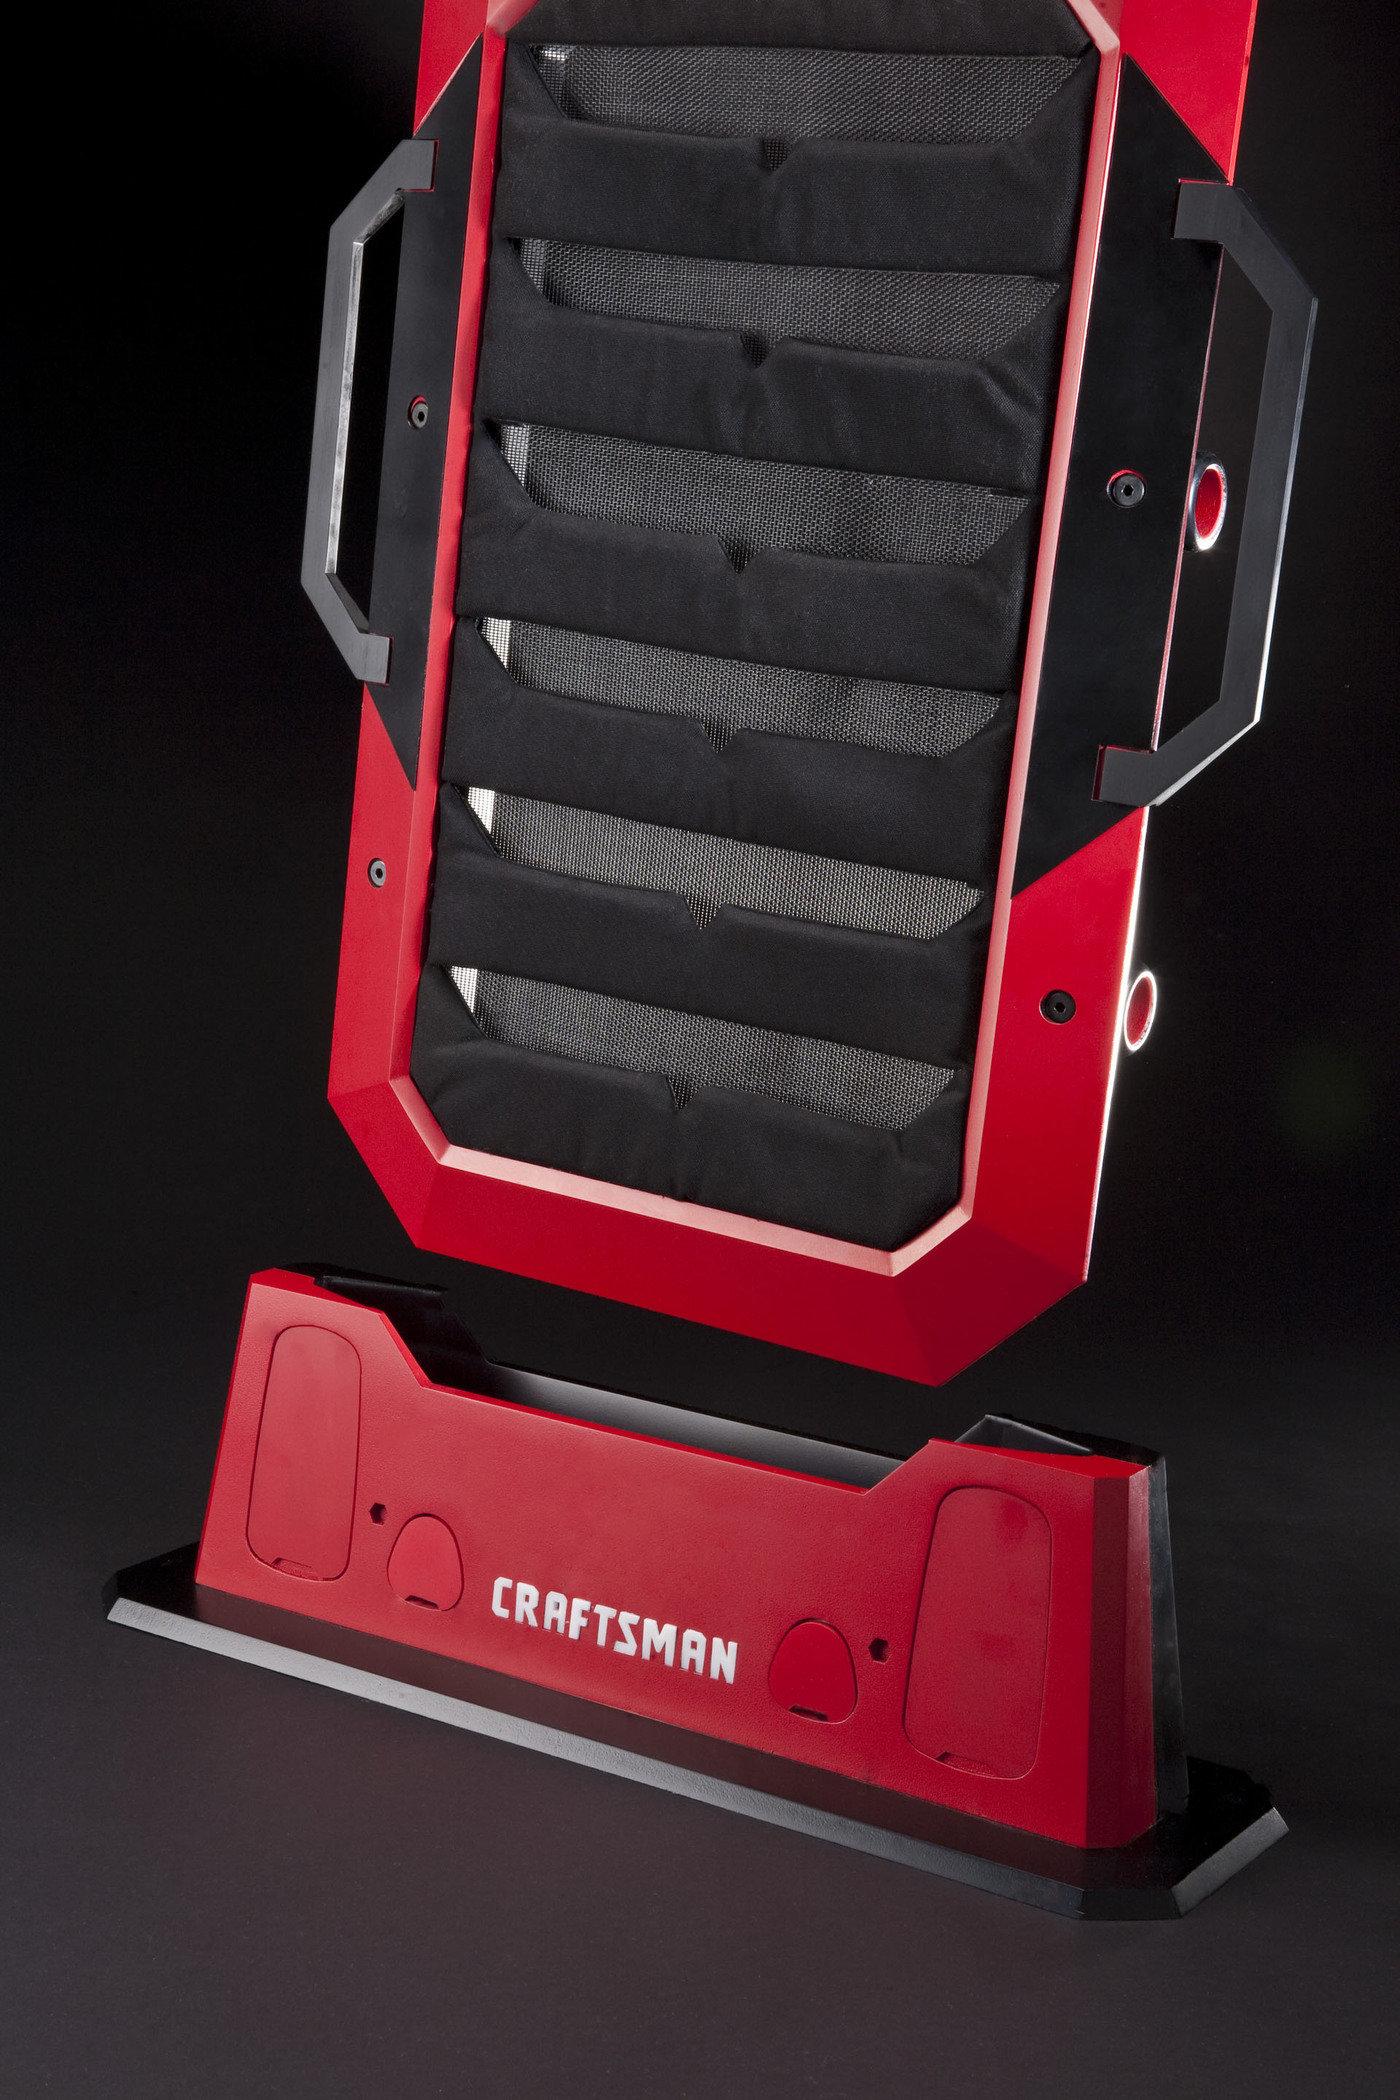 Mechanics Floor Creeper By Jacob Emmert At Coroflot Com